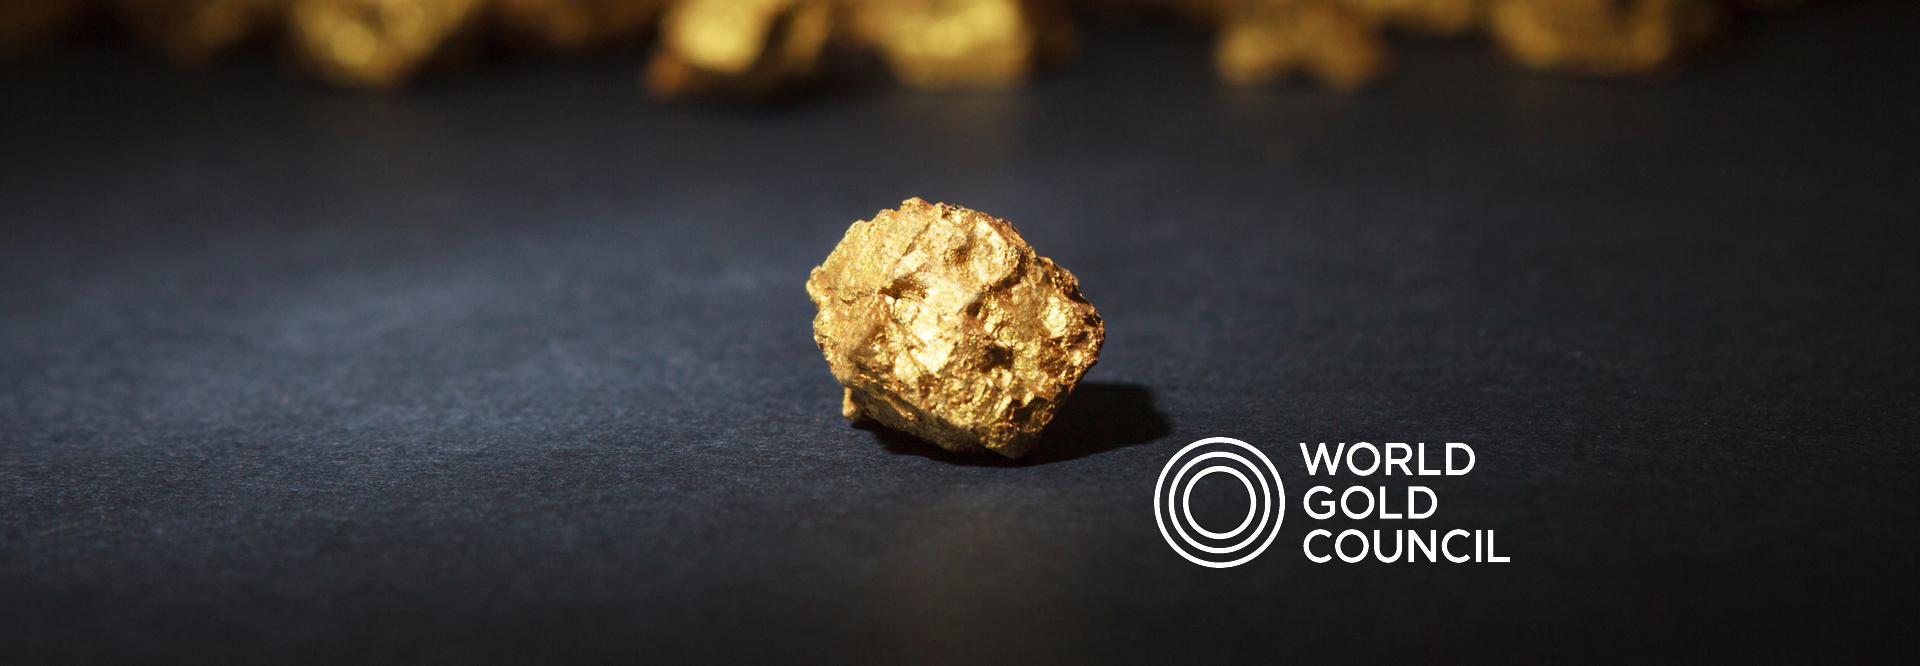 Pepita de oro - Consejo Mundial del Oro